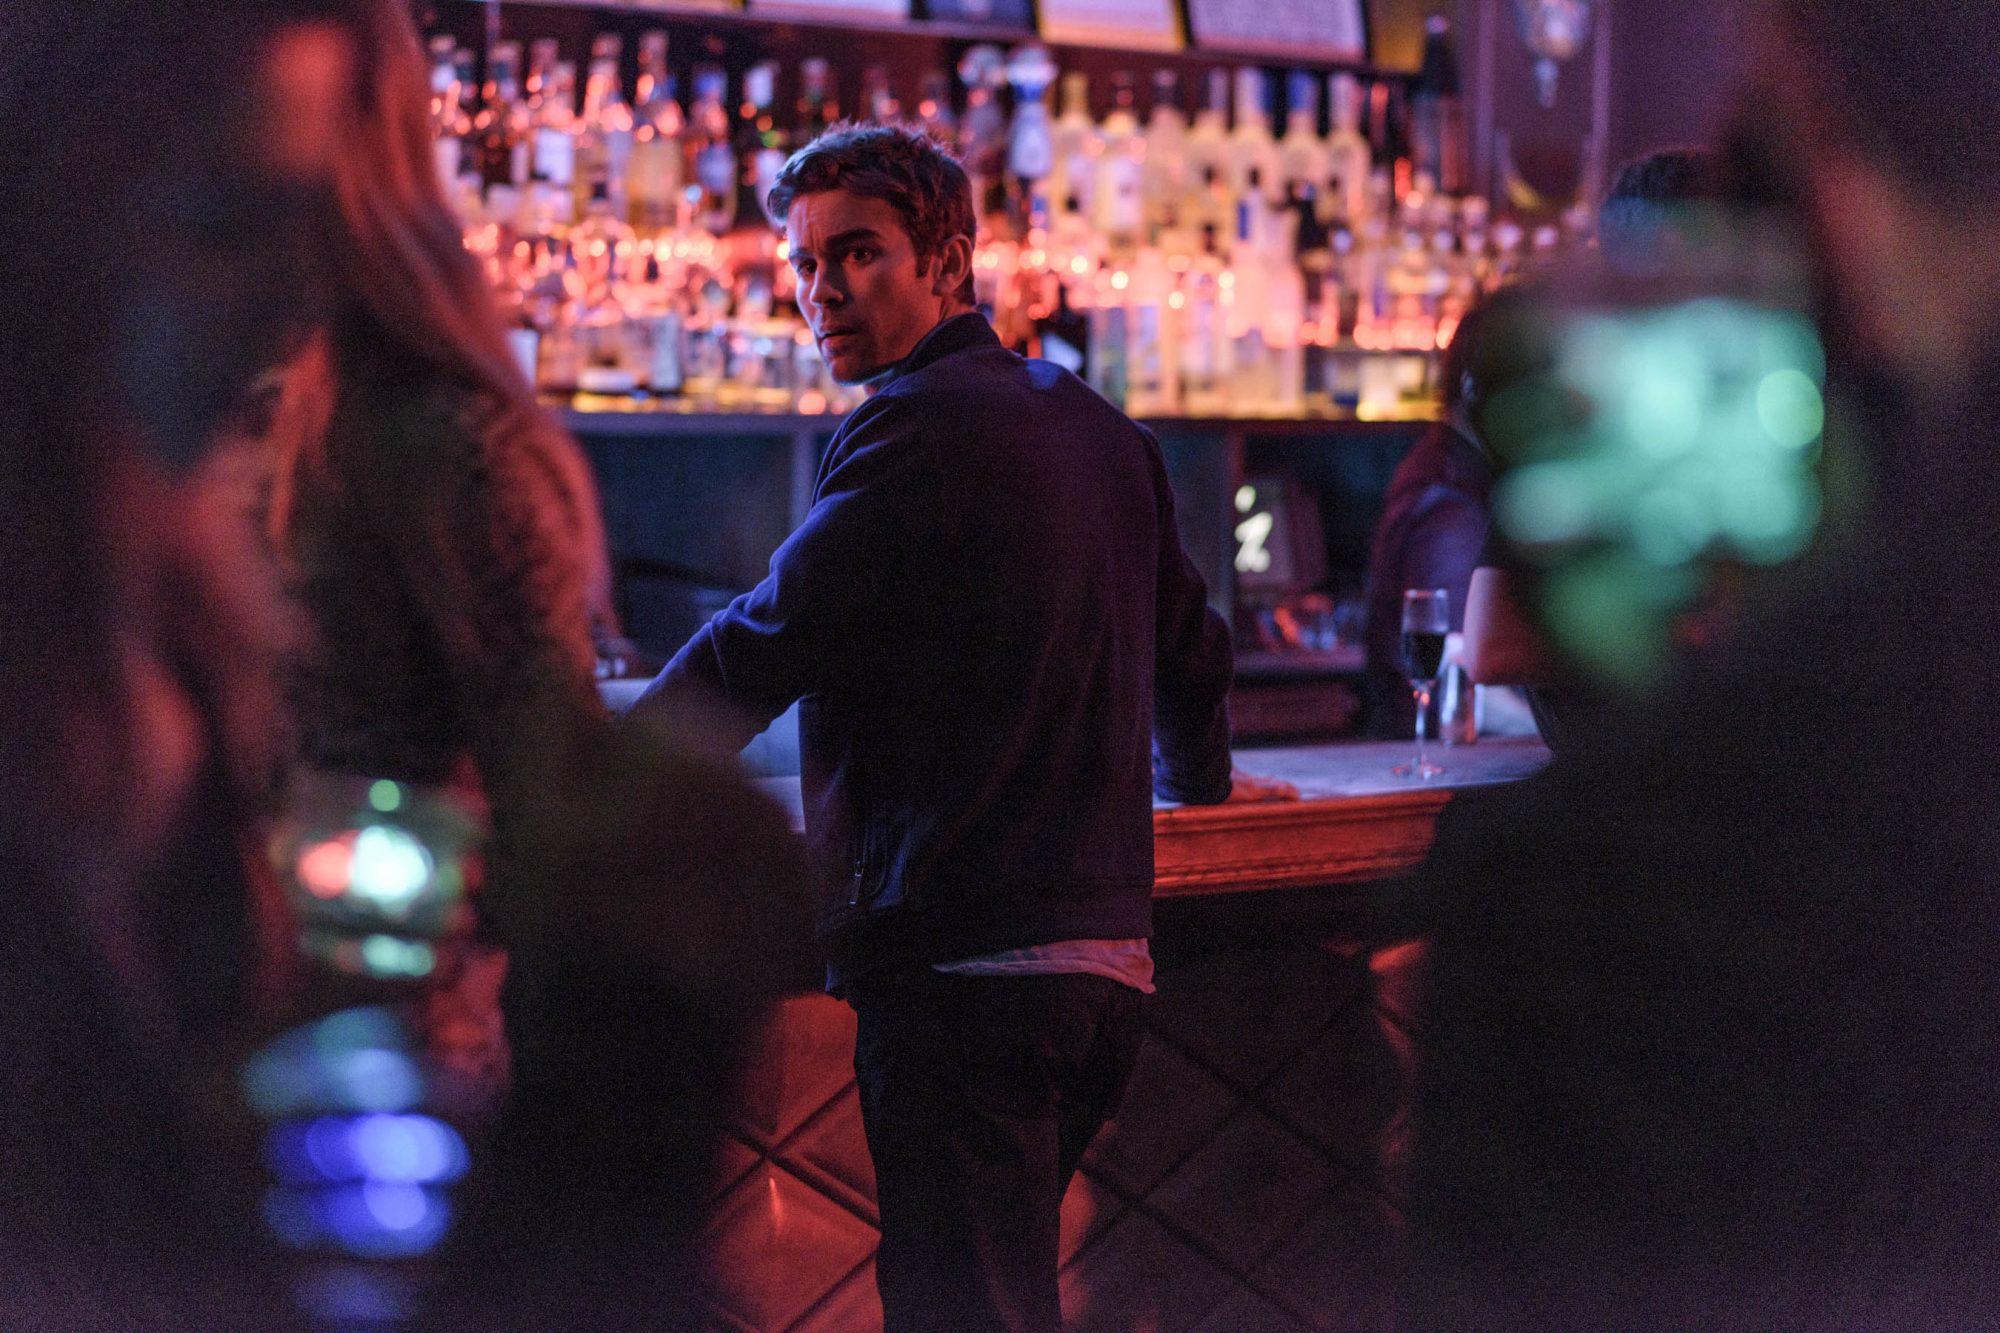 Nighthawks Chace Crawford CR: FilmRise Releasing